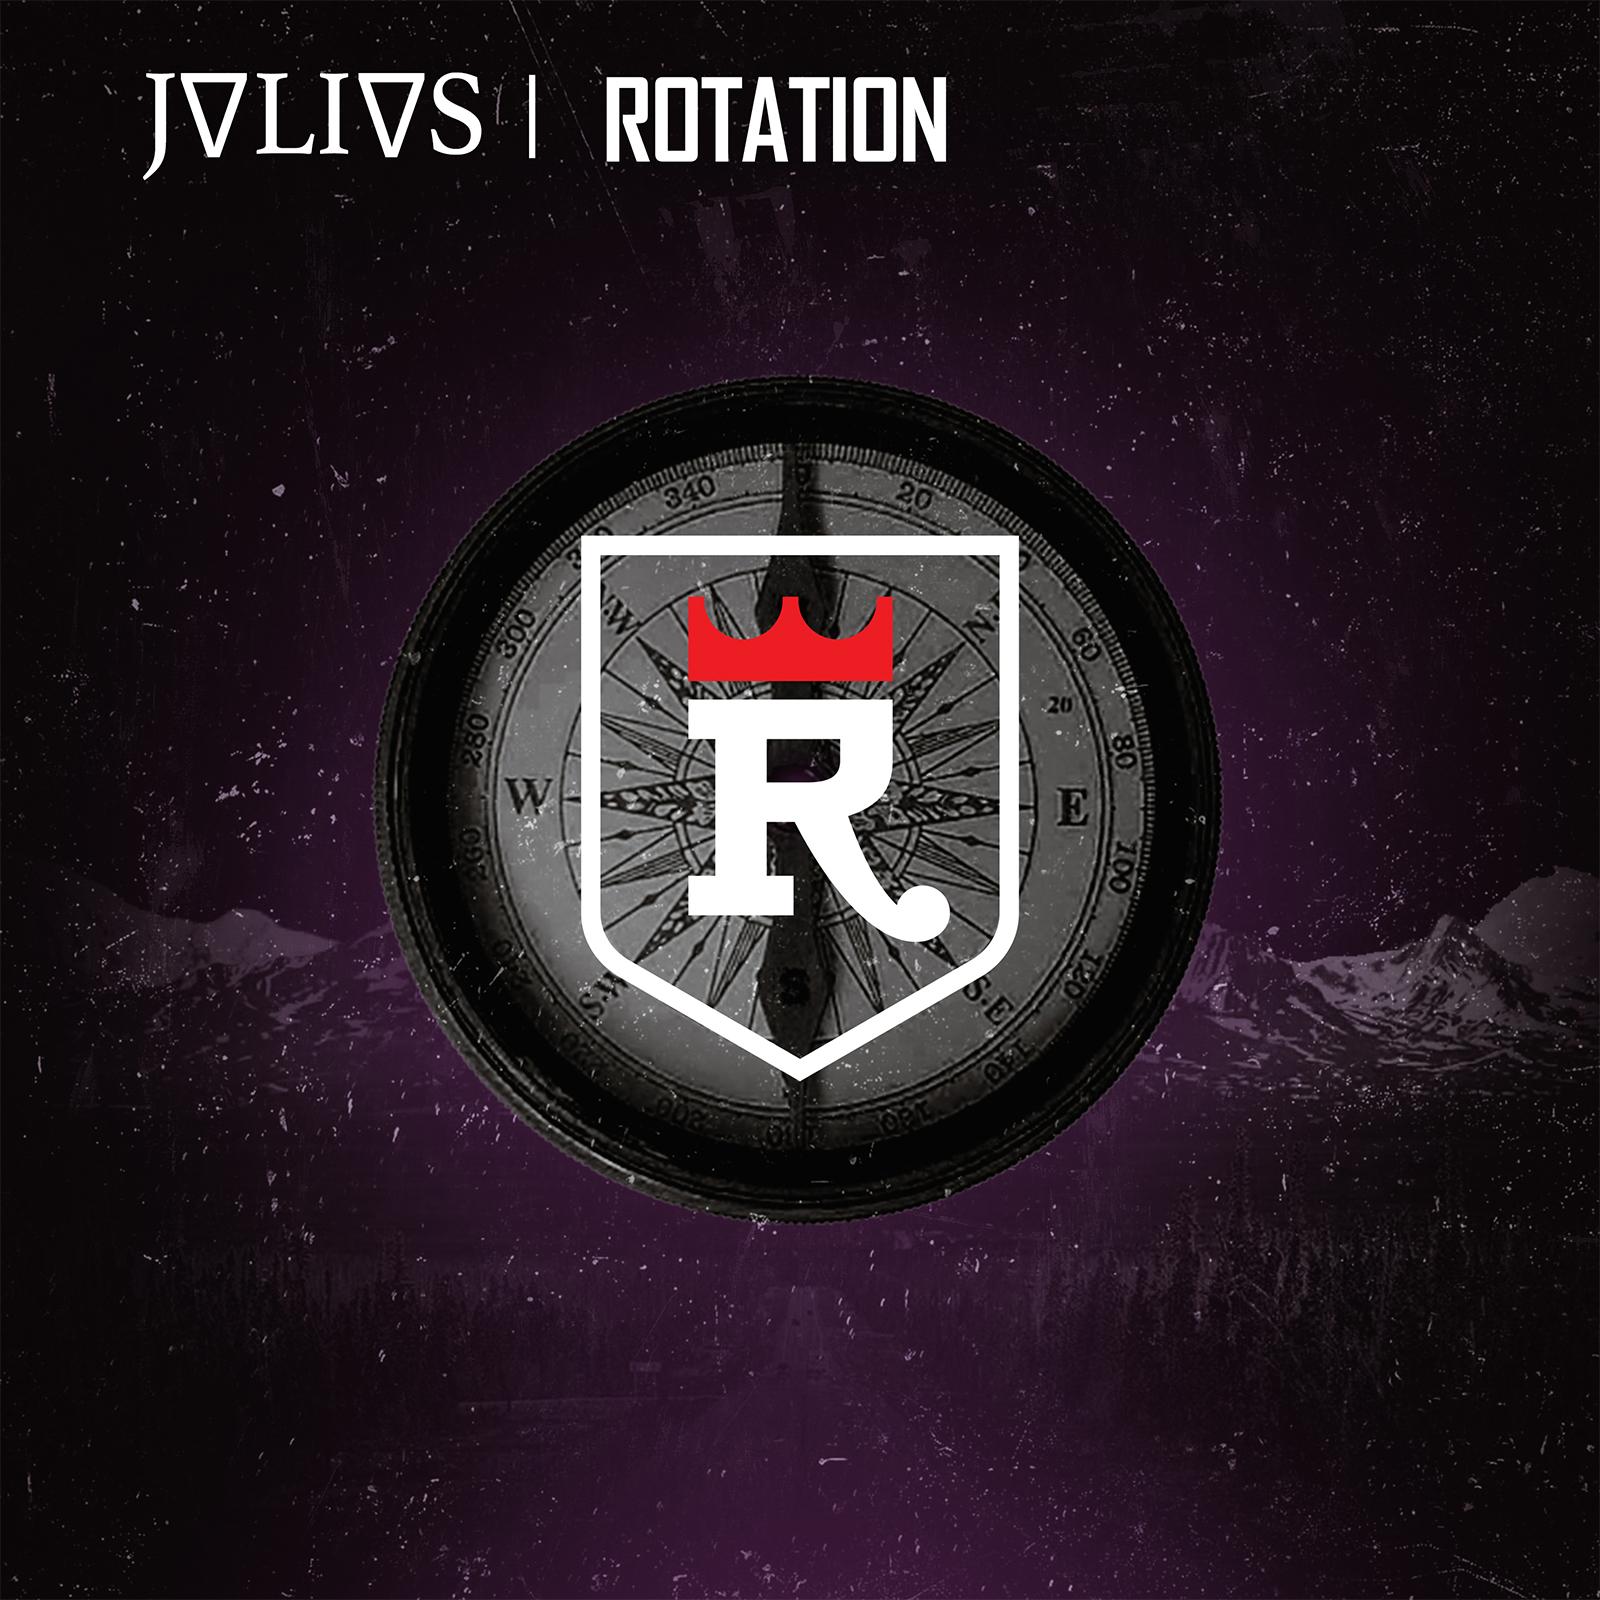 Julius Rotation